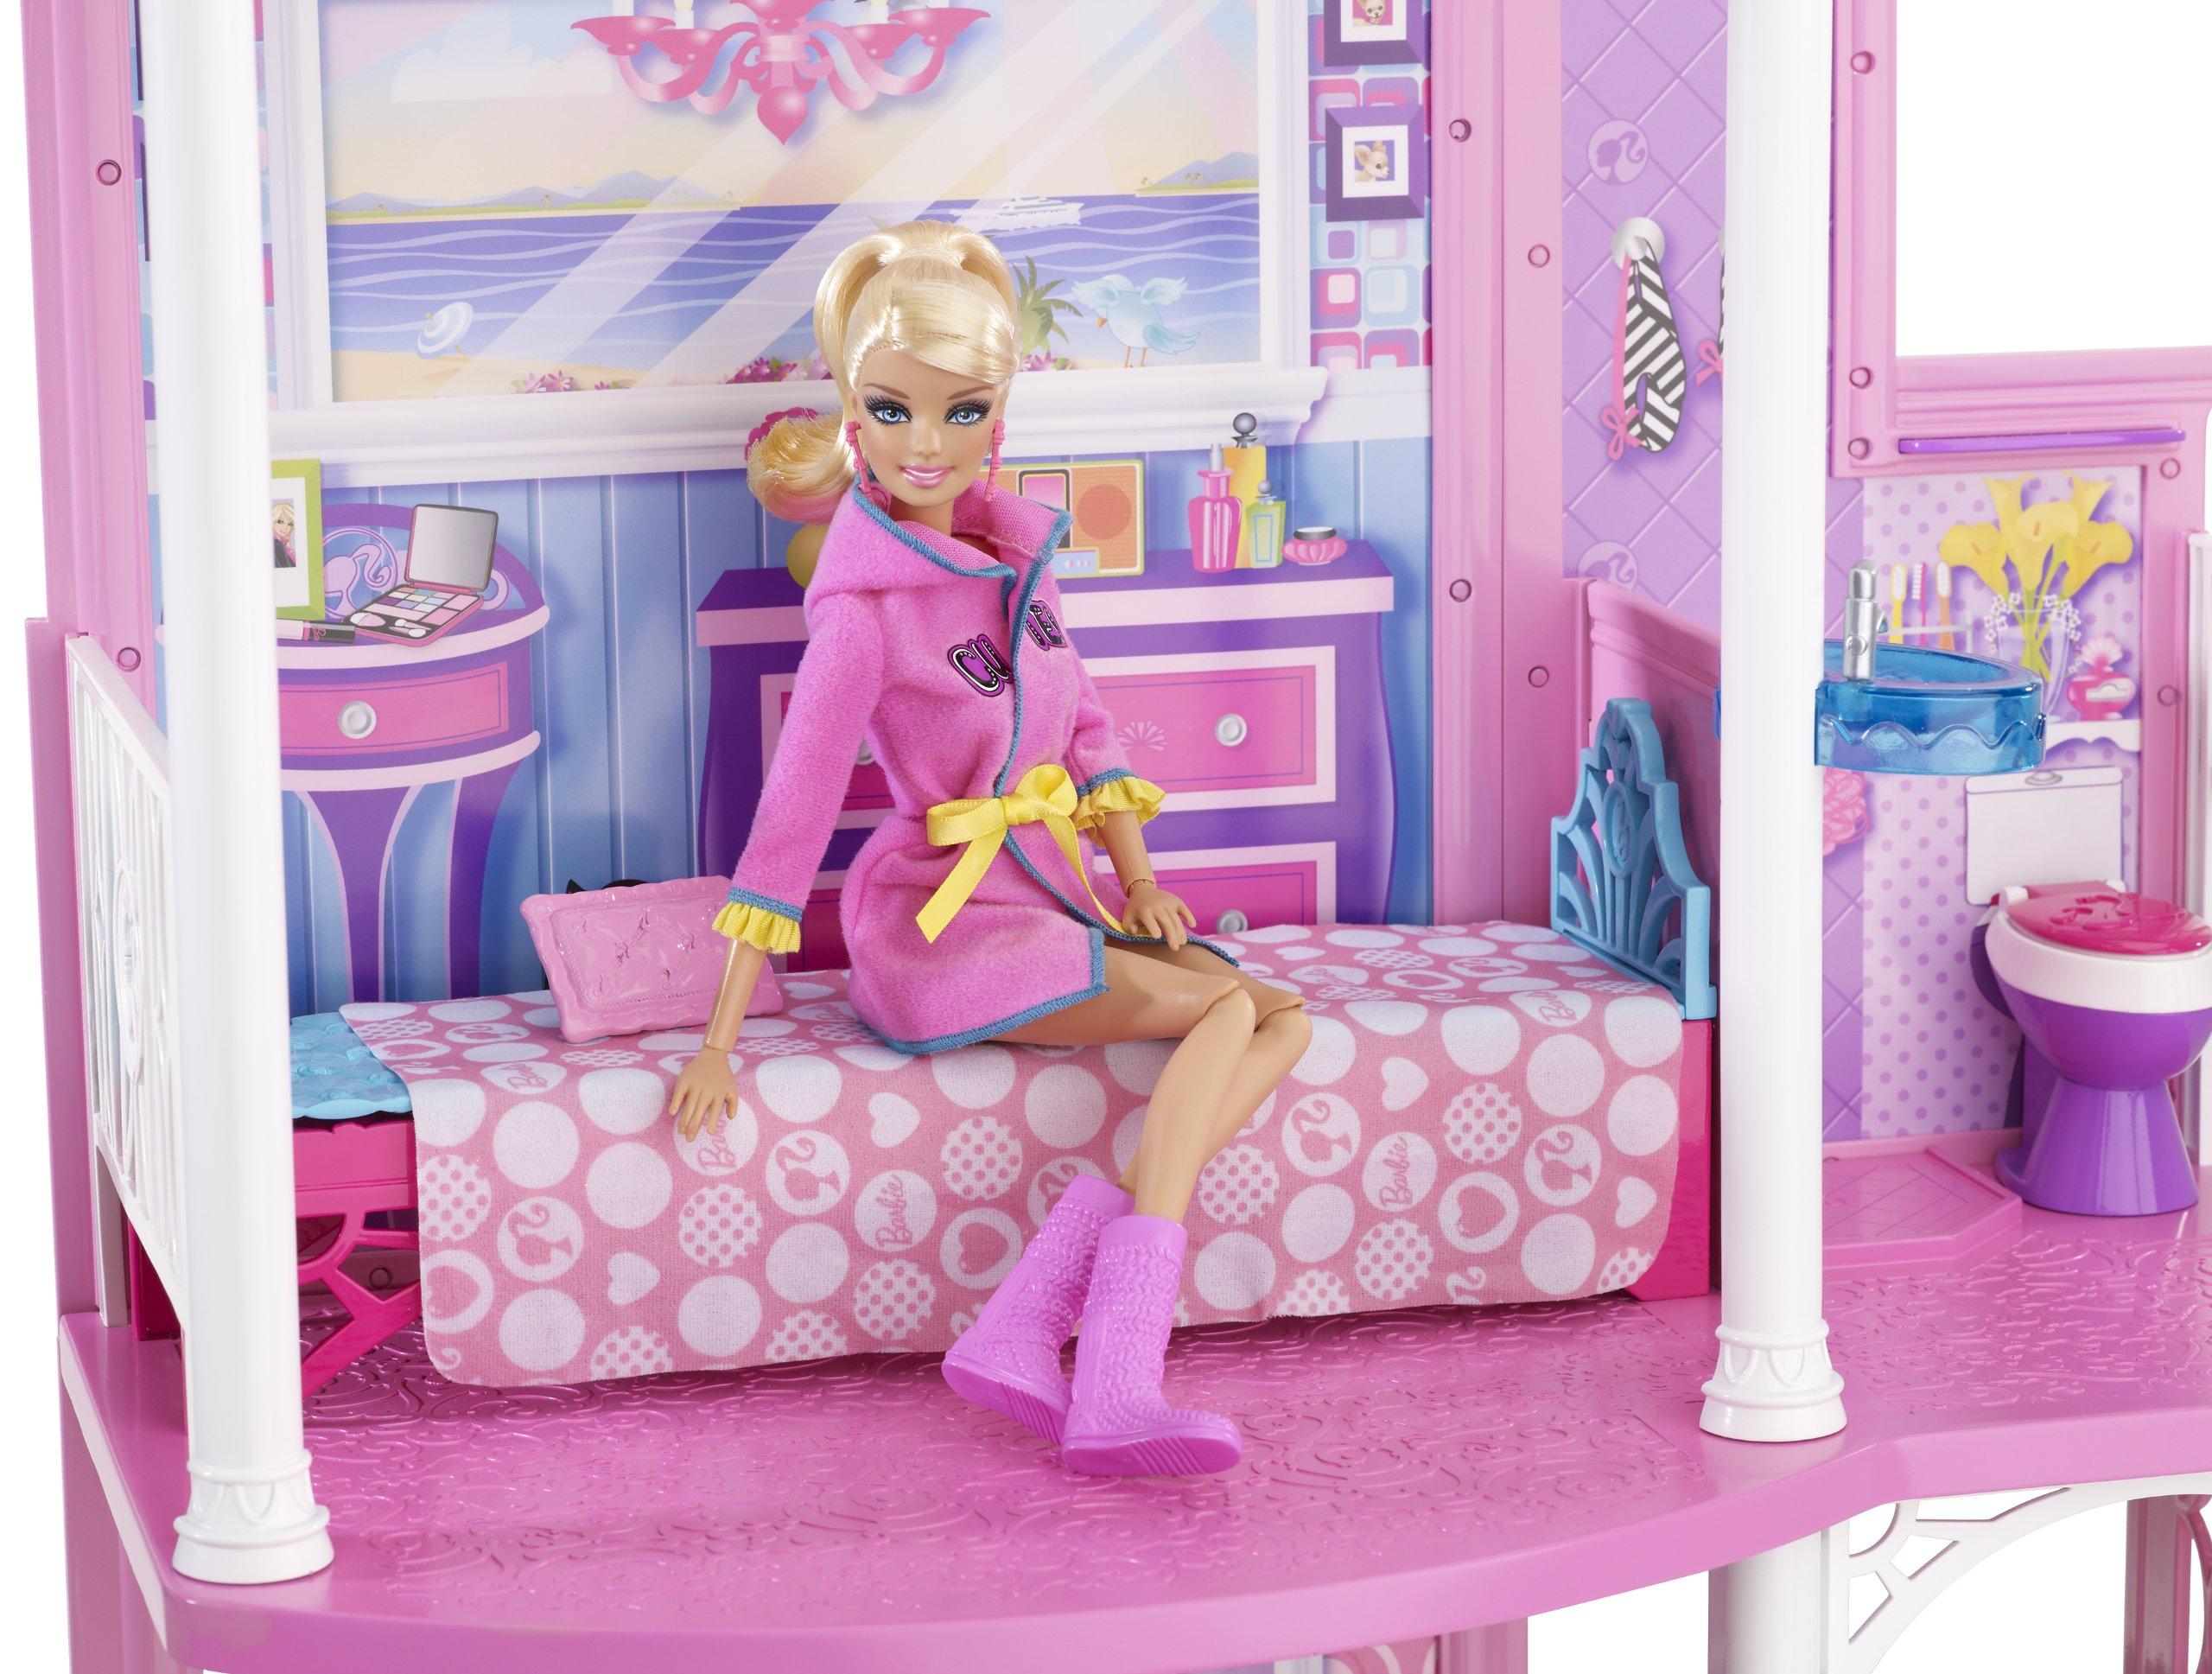 Barbie 2-Story Beach House by Barbie (Image #8)